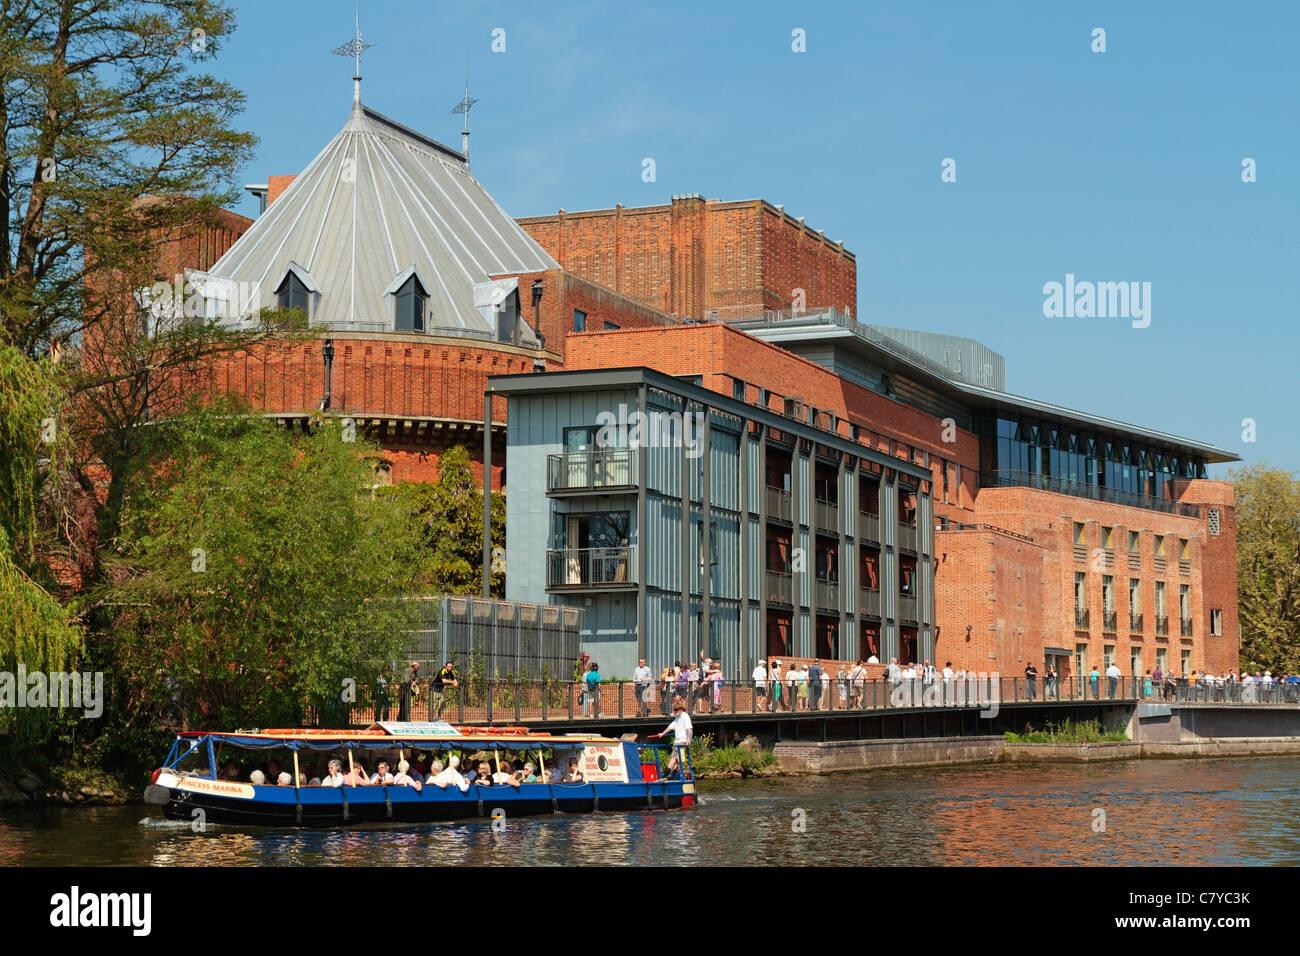 Royal Shakespeare Theatre, River Avon, Stratford-upon-avon, Warwickshire, England, United Kingdom Stock Photo